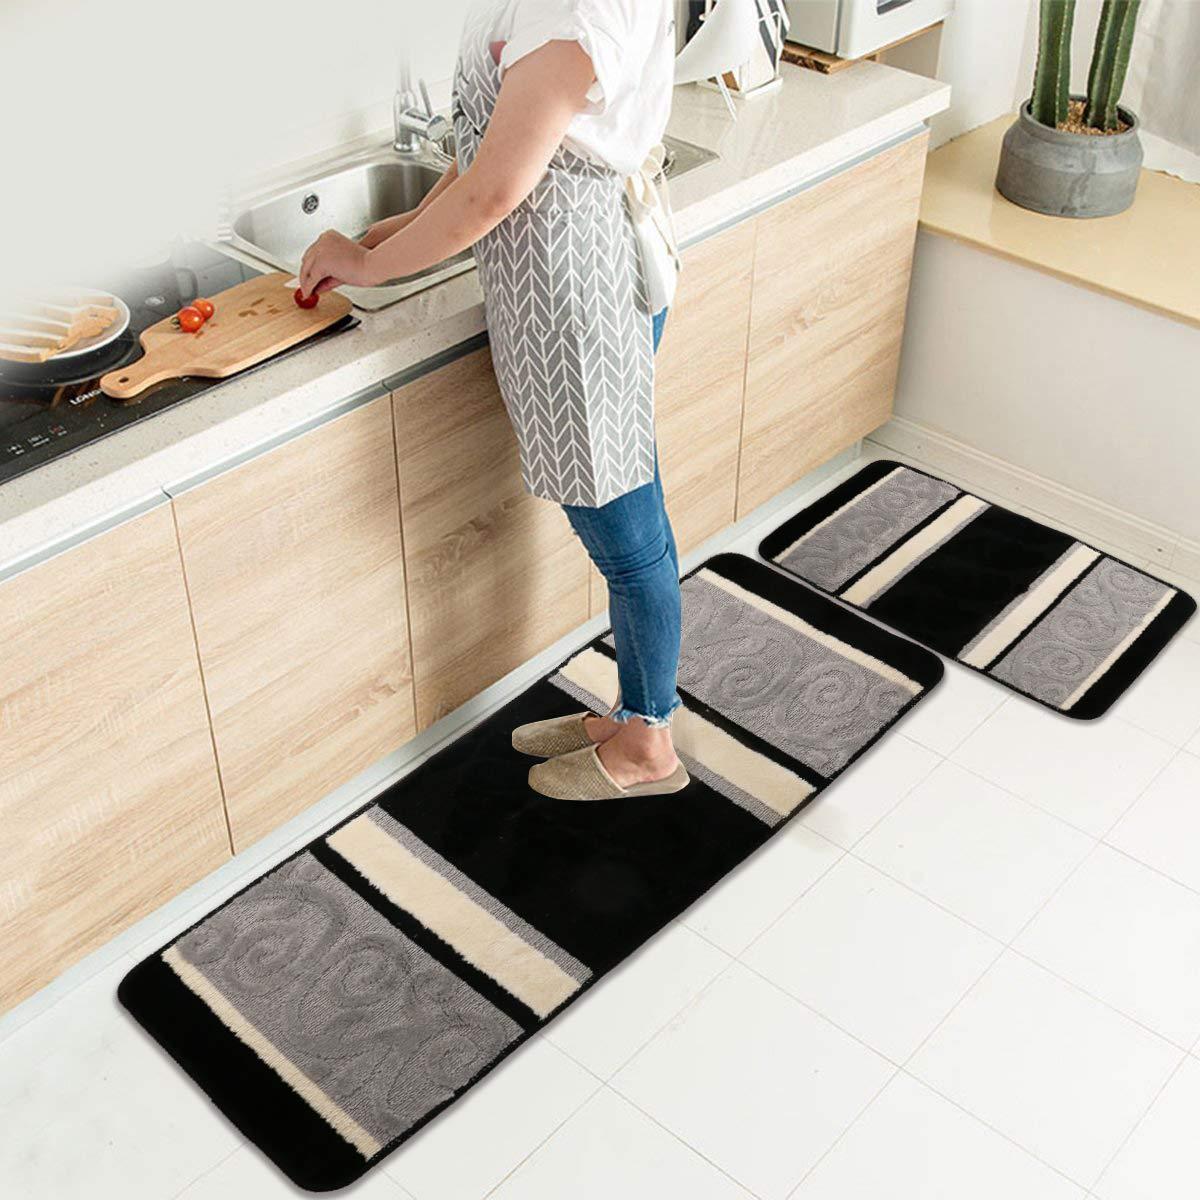 HEBE Kitchen Rugs Set 9 Pieces Non Slip Washable Kitchen Mat Rug Runner  Sets Rubber Backing Indoor Outdoor Doormat Runner Rug Set 9